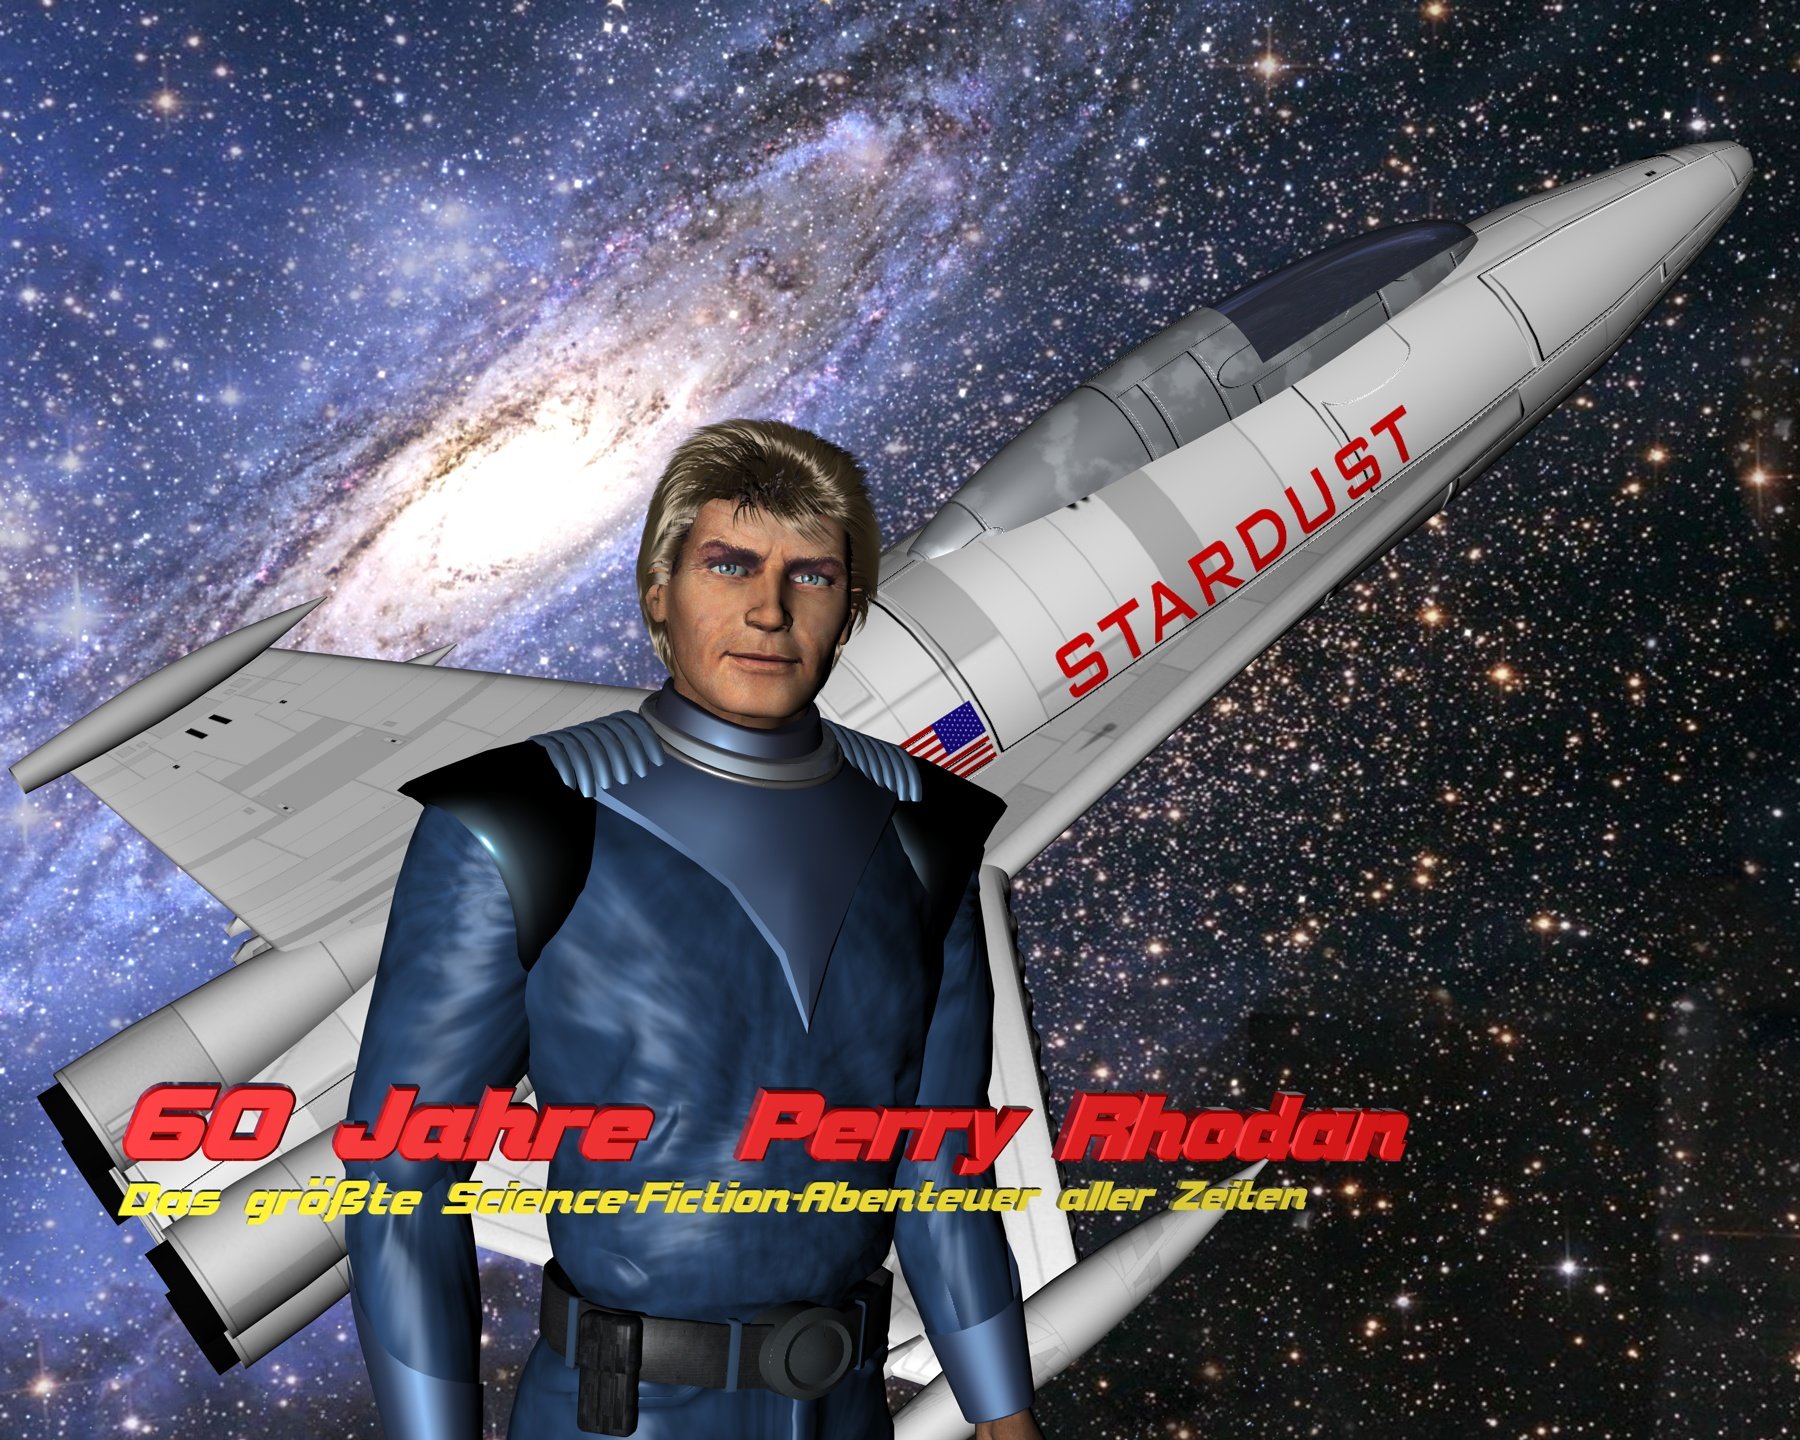 60 Jahre PERRY RHODAN Tribut Stardust – © Raimund Peter